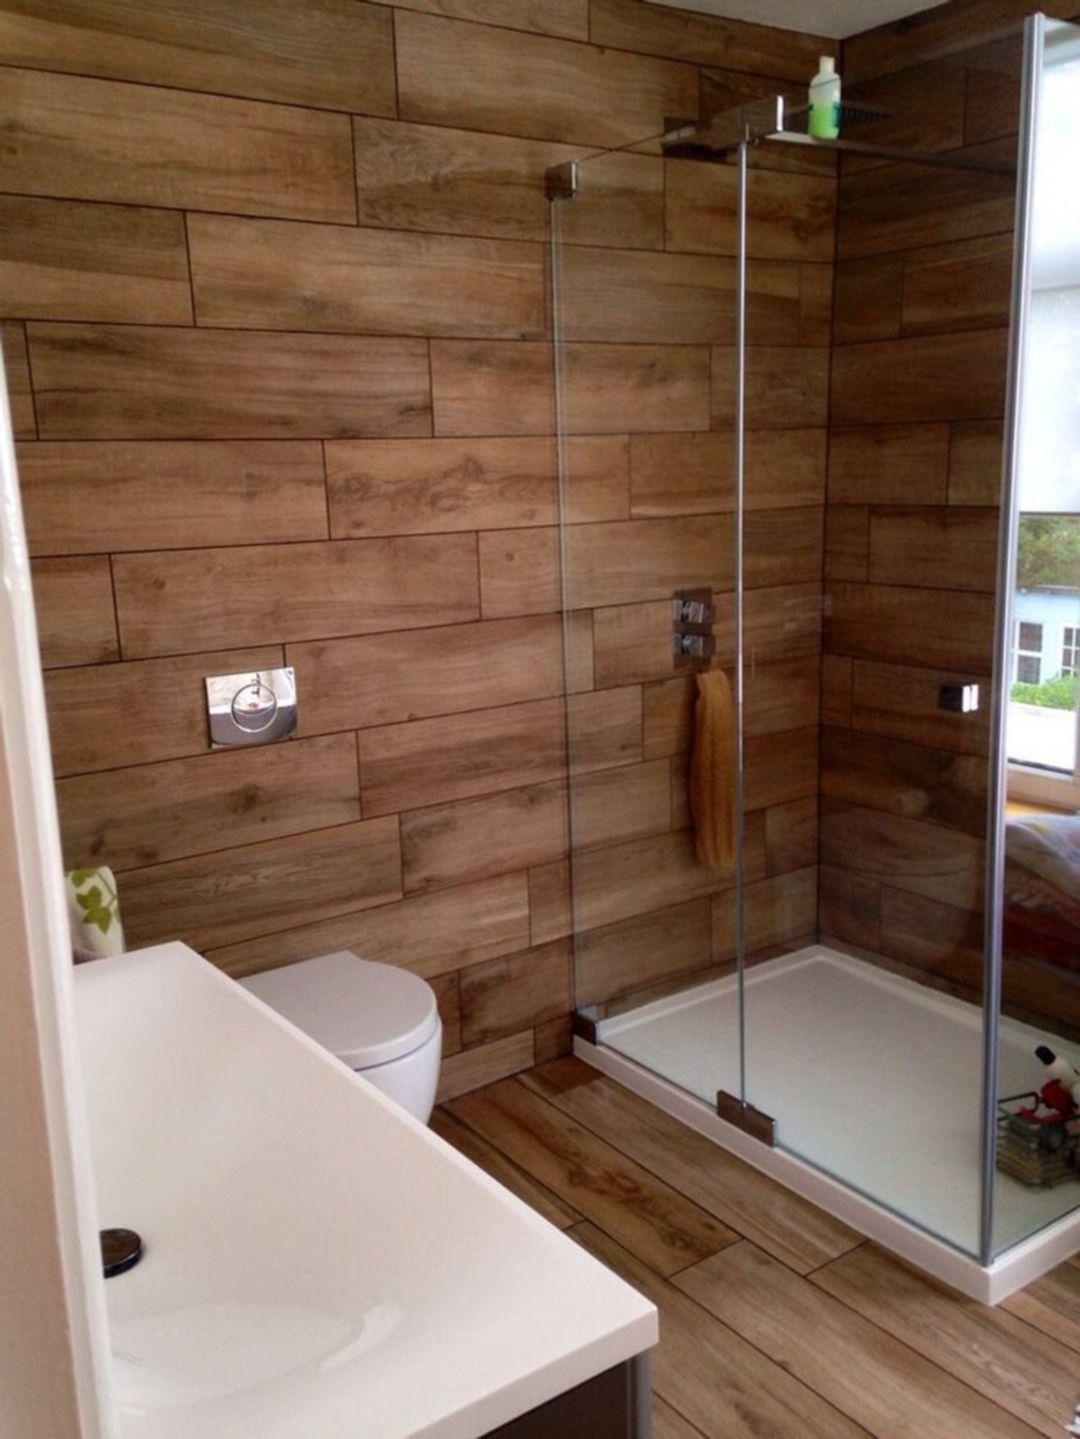 15 Amazing Floor Design Ideas For Your Bathroom